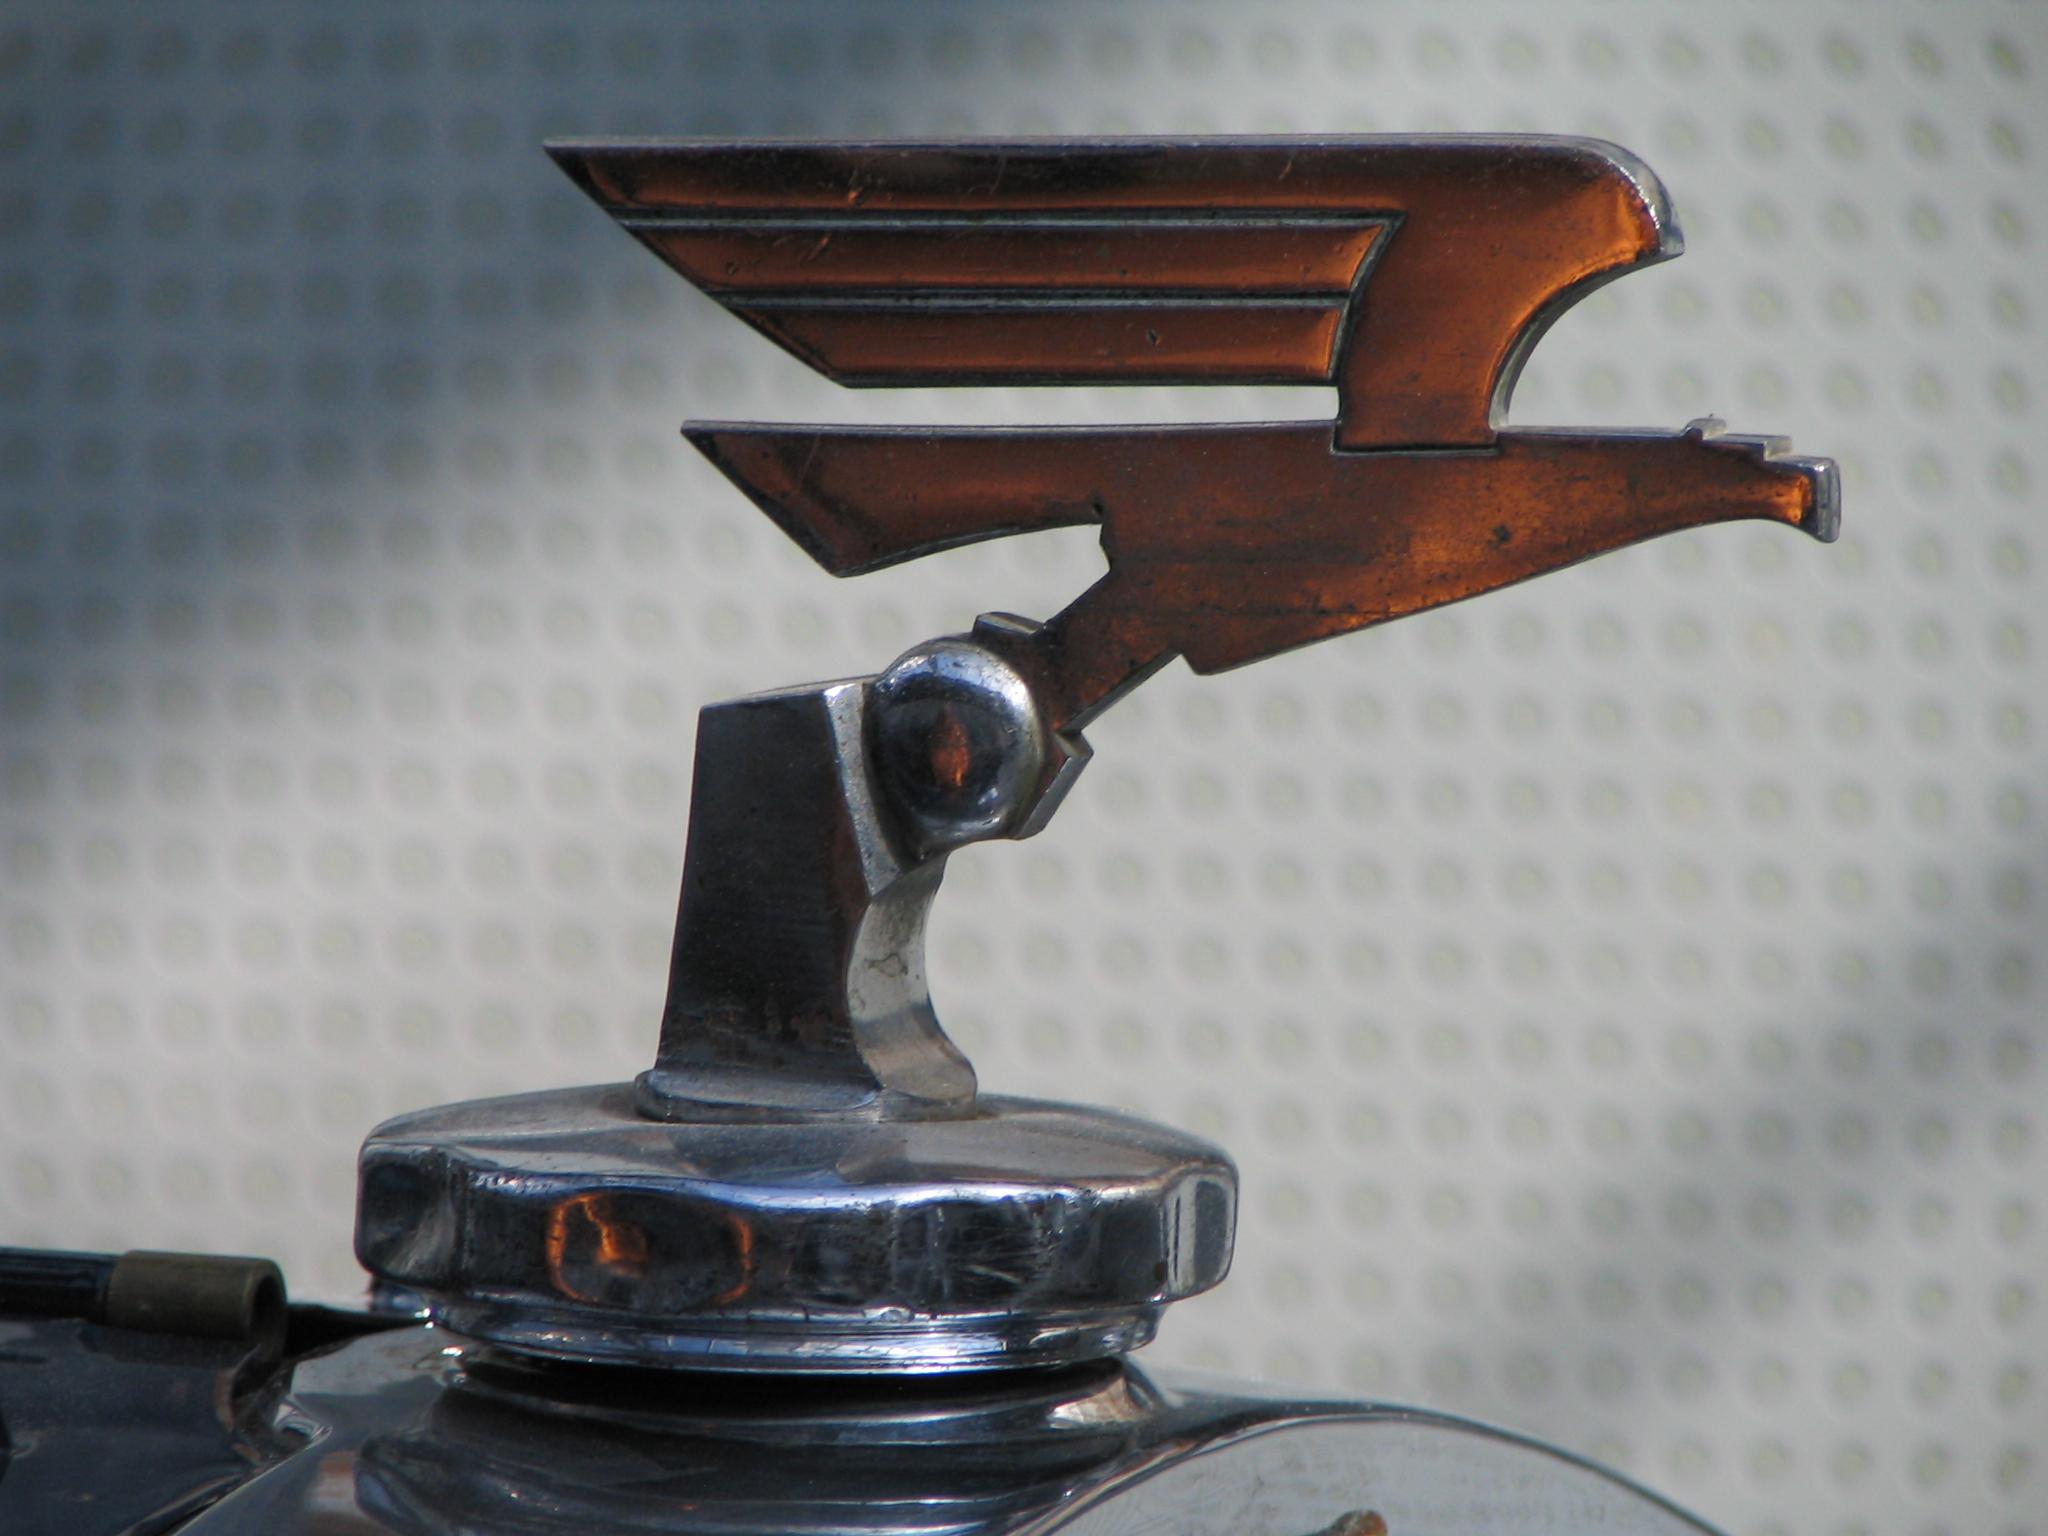 Adler (automobile)